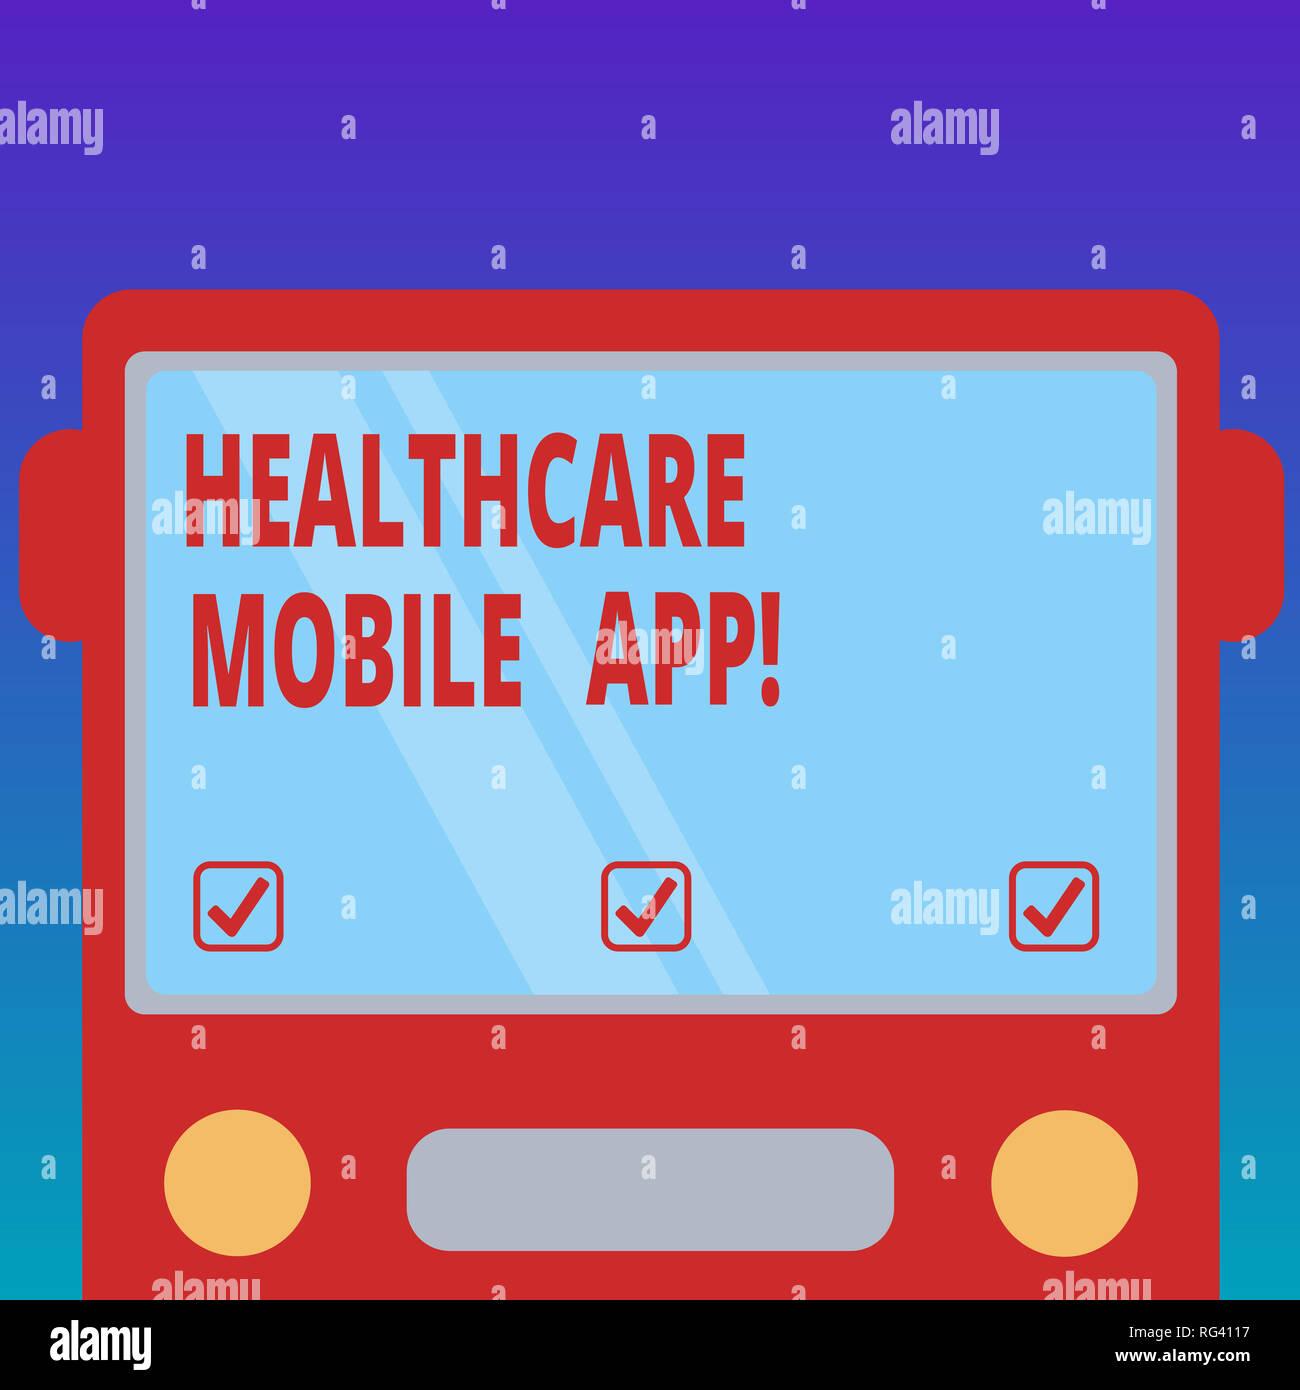 Mobile Clinic Hospital Bus Stock Photos & Mobile Clinic